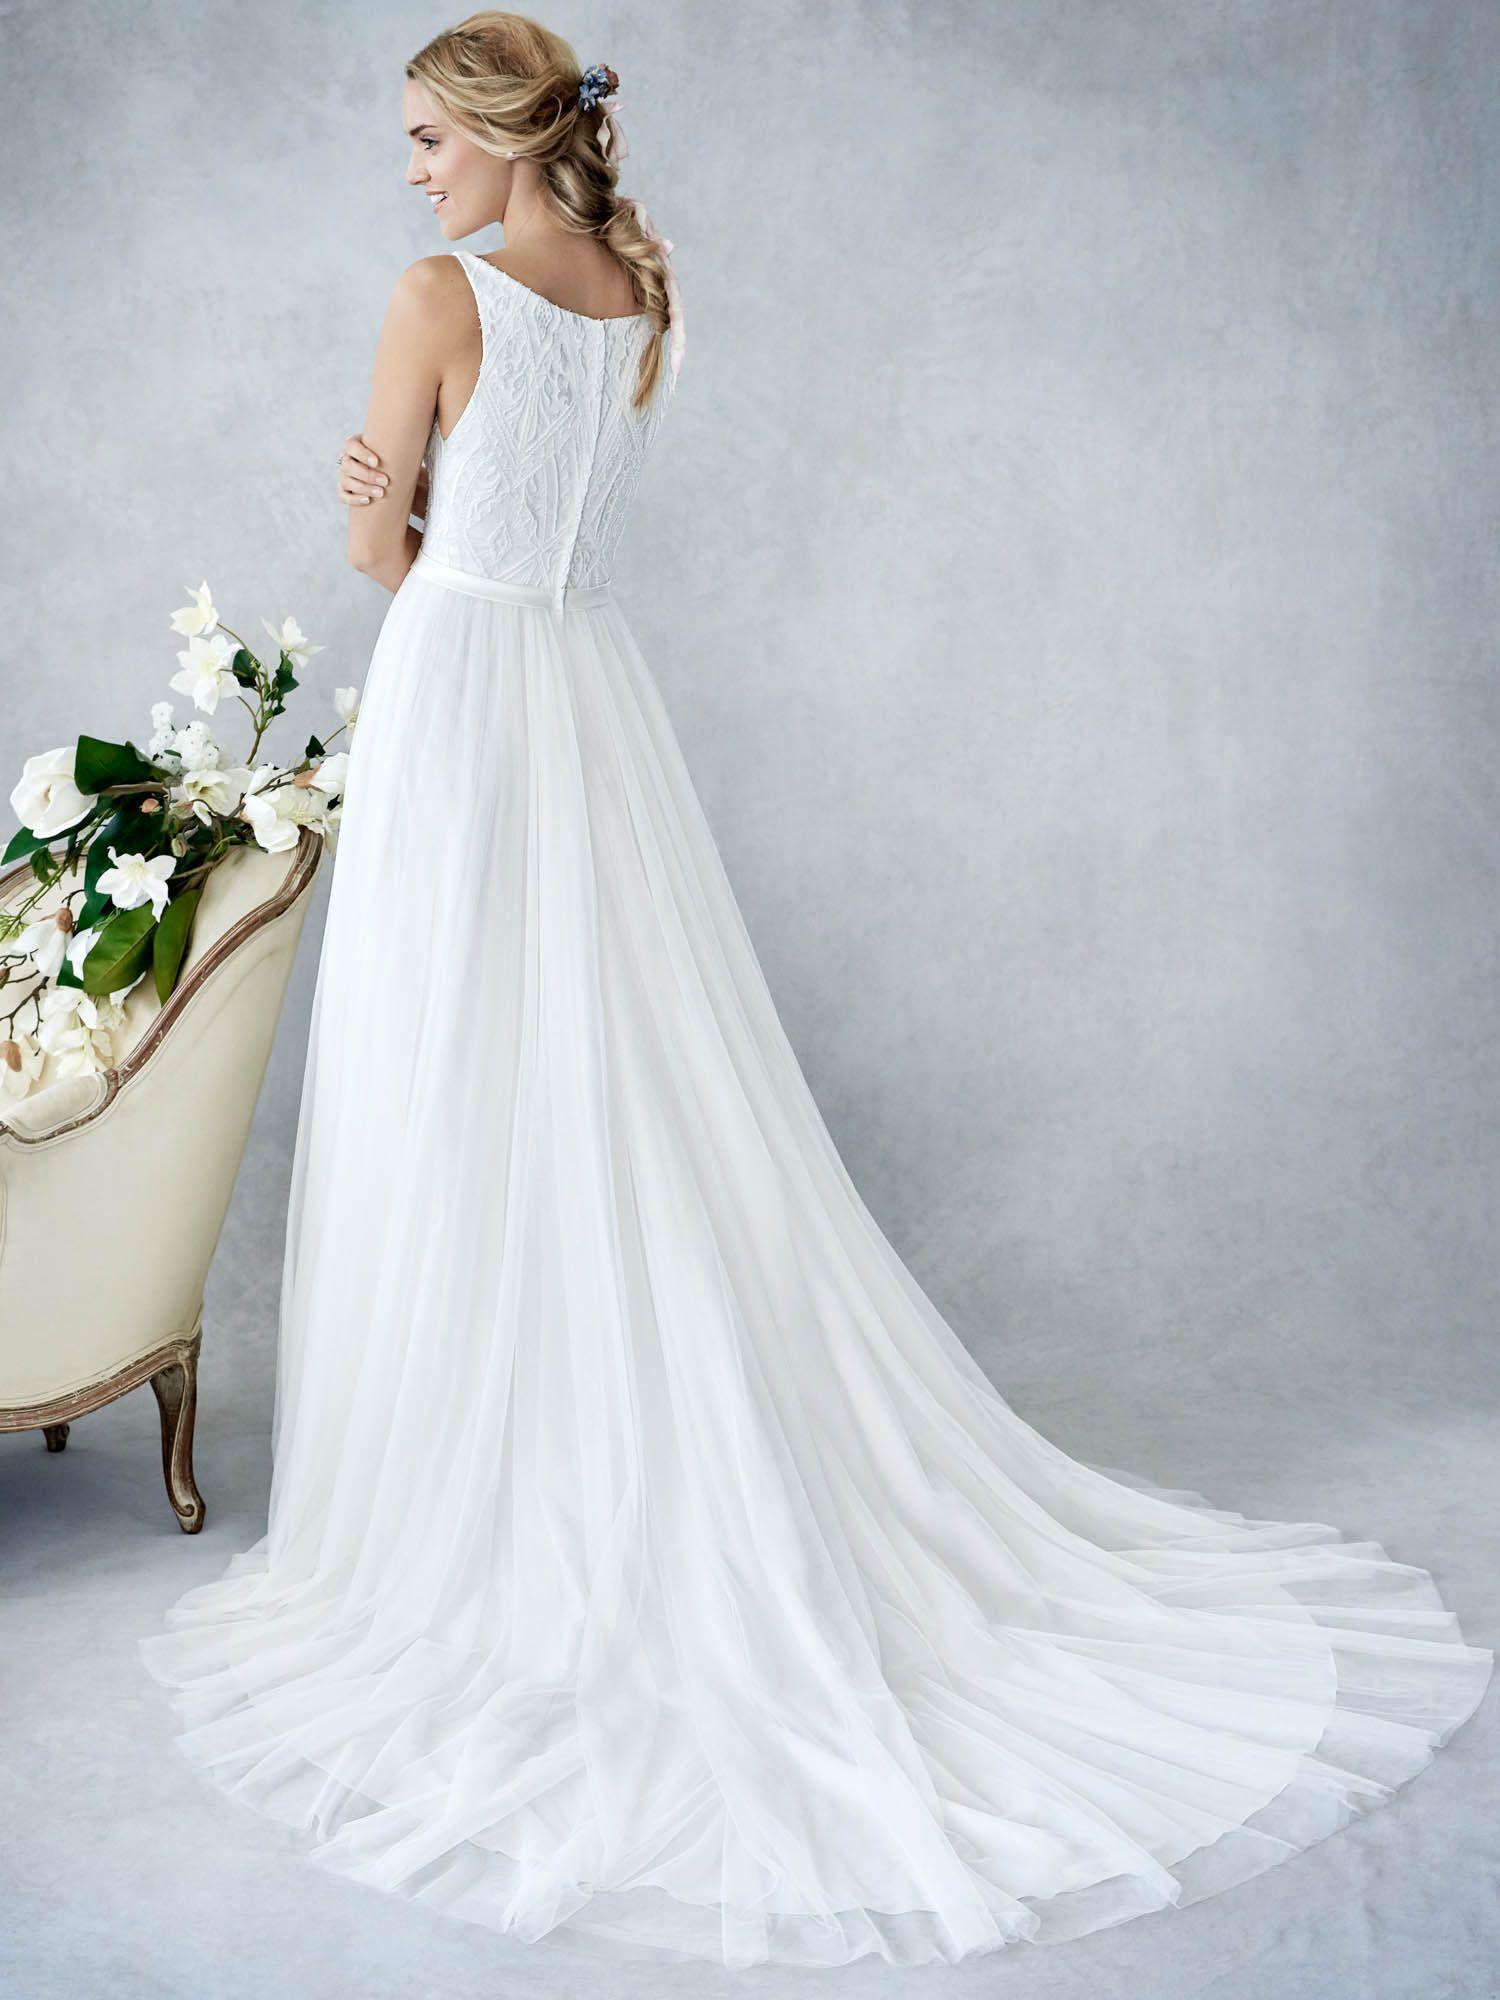 29+ Wedding dress neckline for big bust ideas